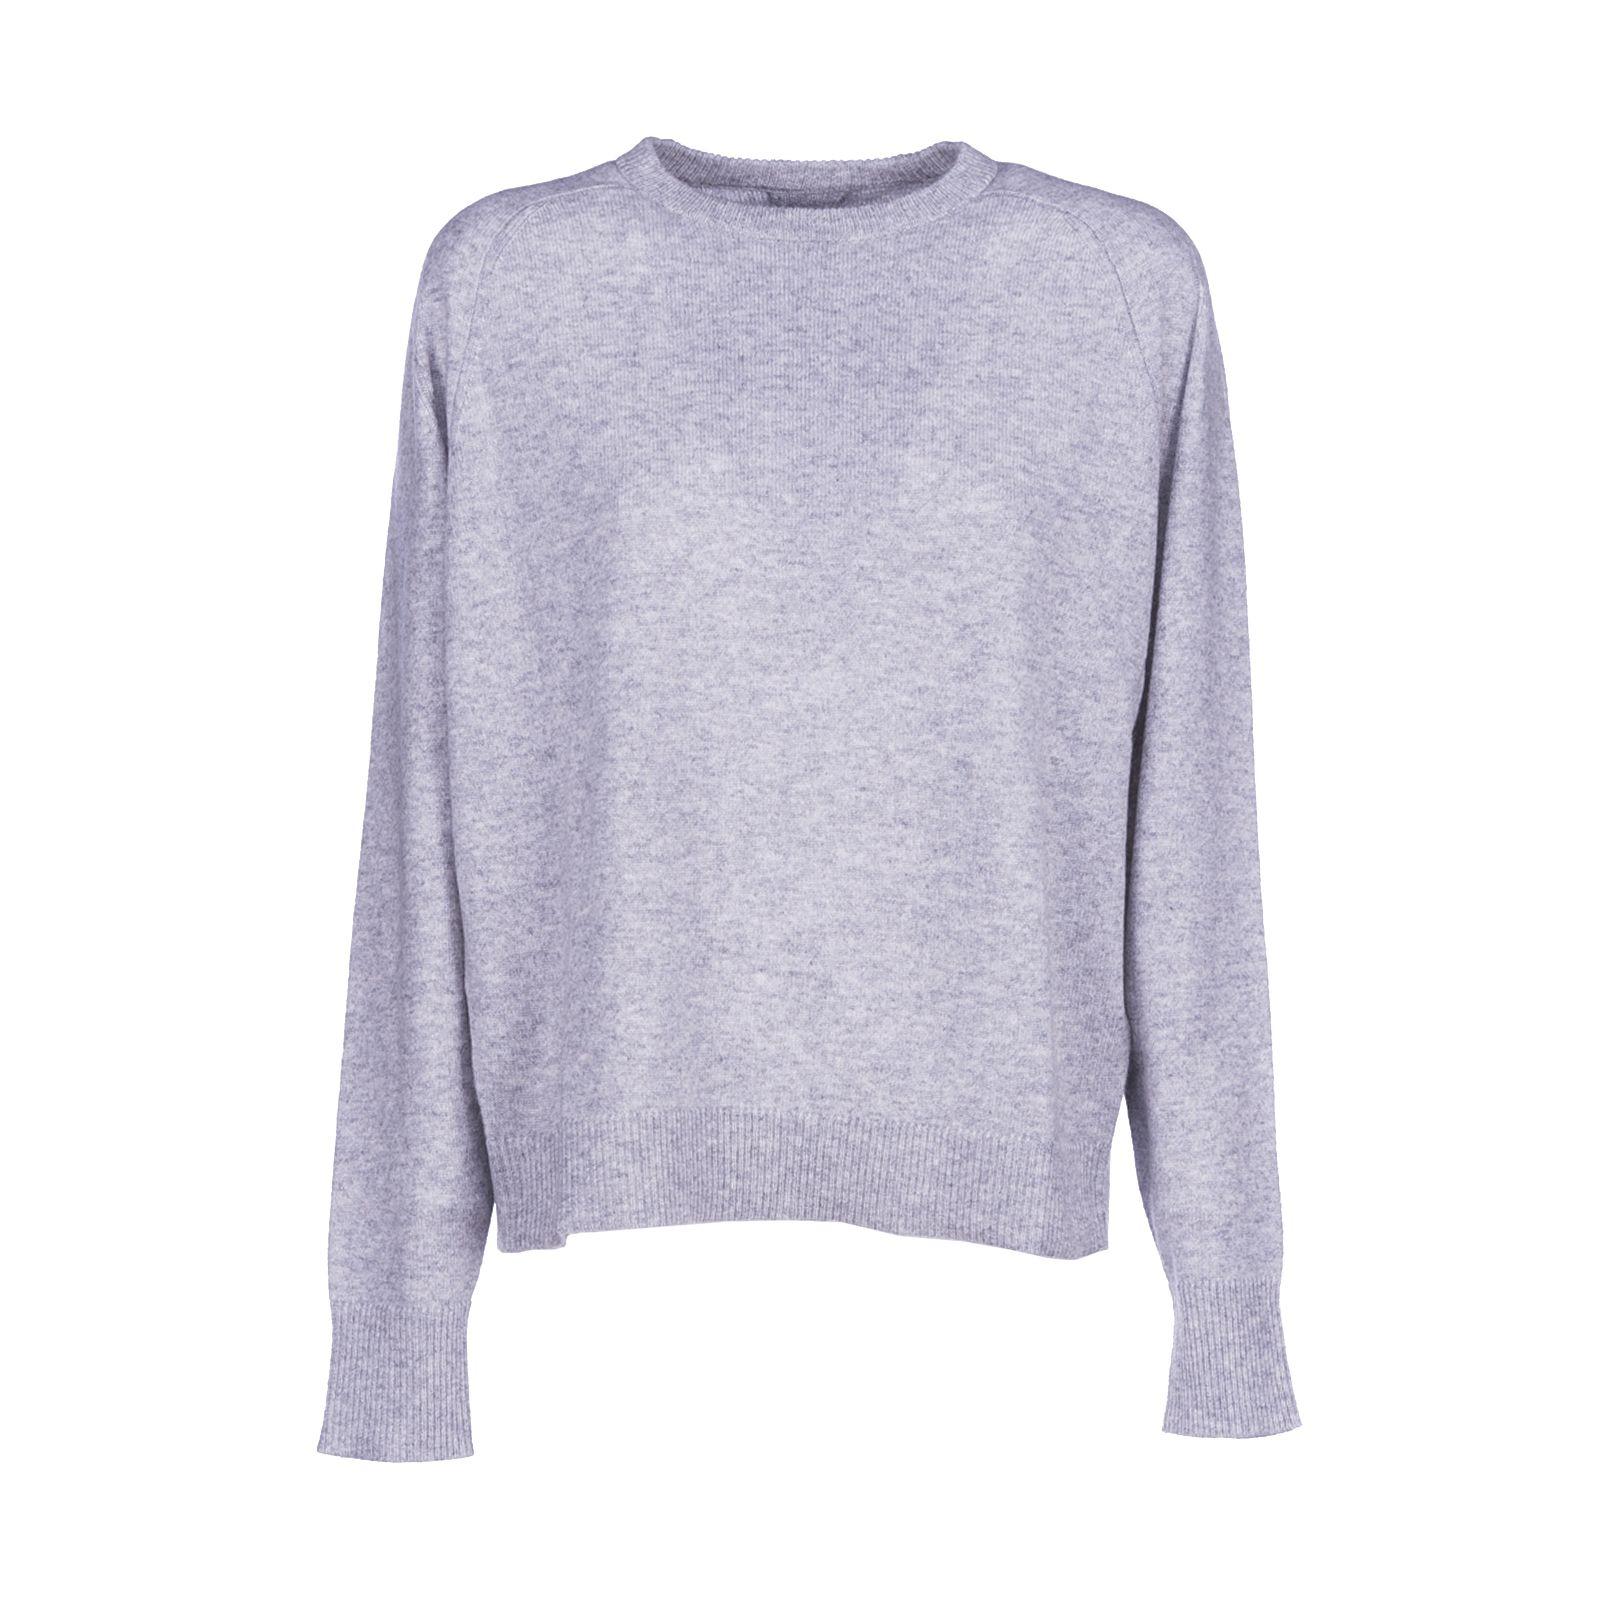 Isabel Marant Clash Sweater